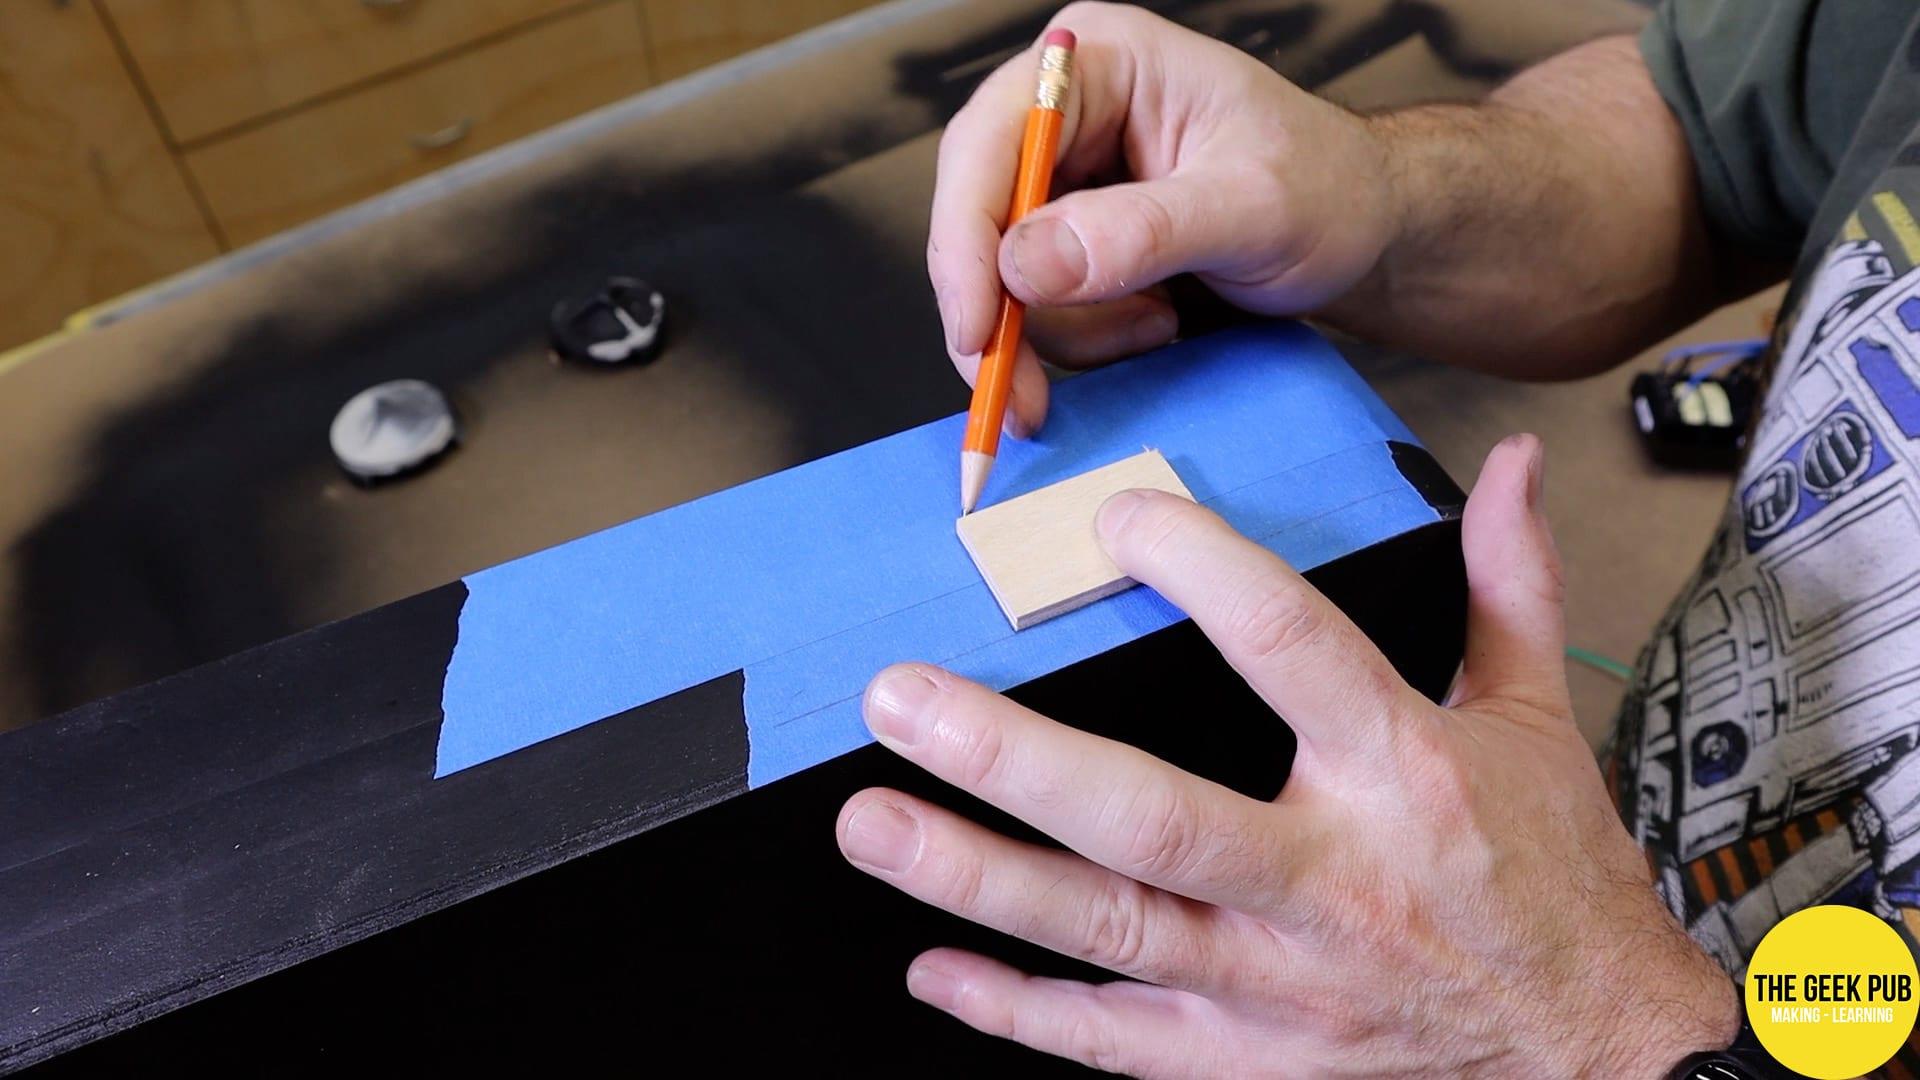 Cutting the IEC-14 hole